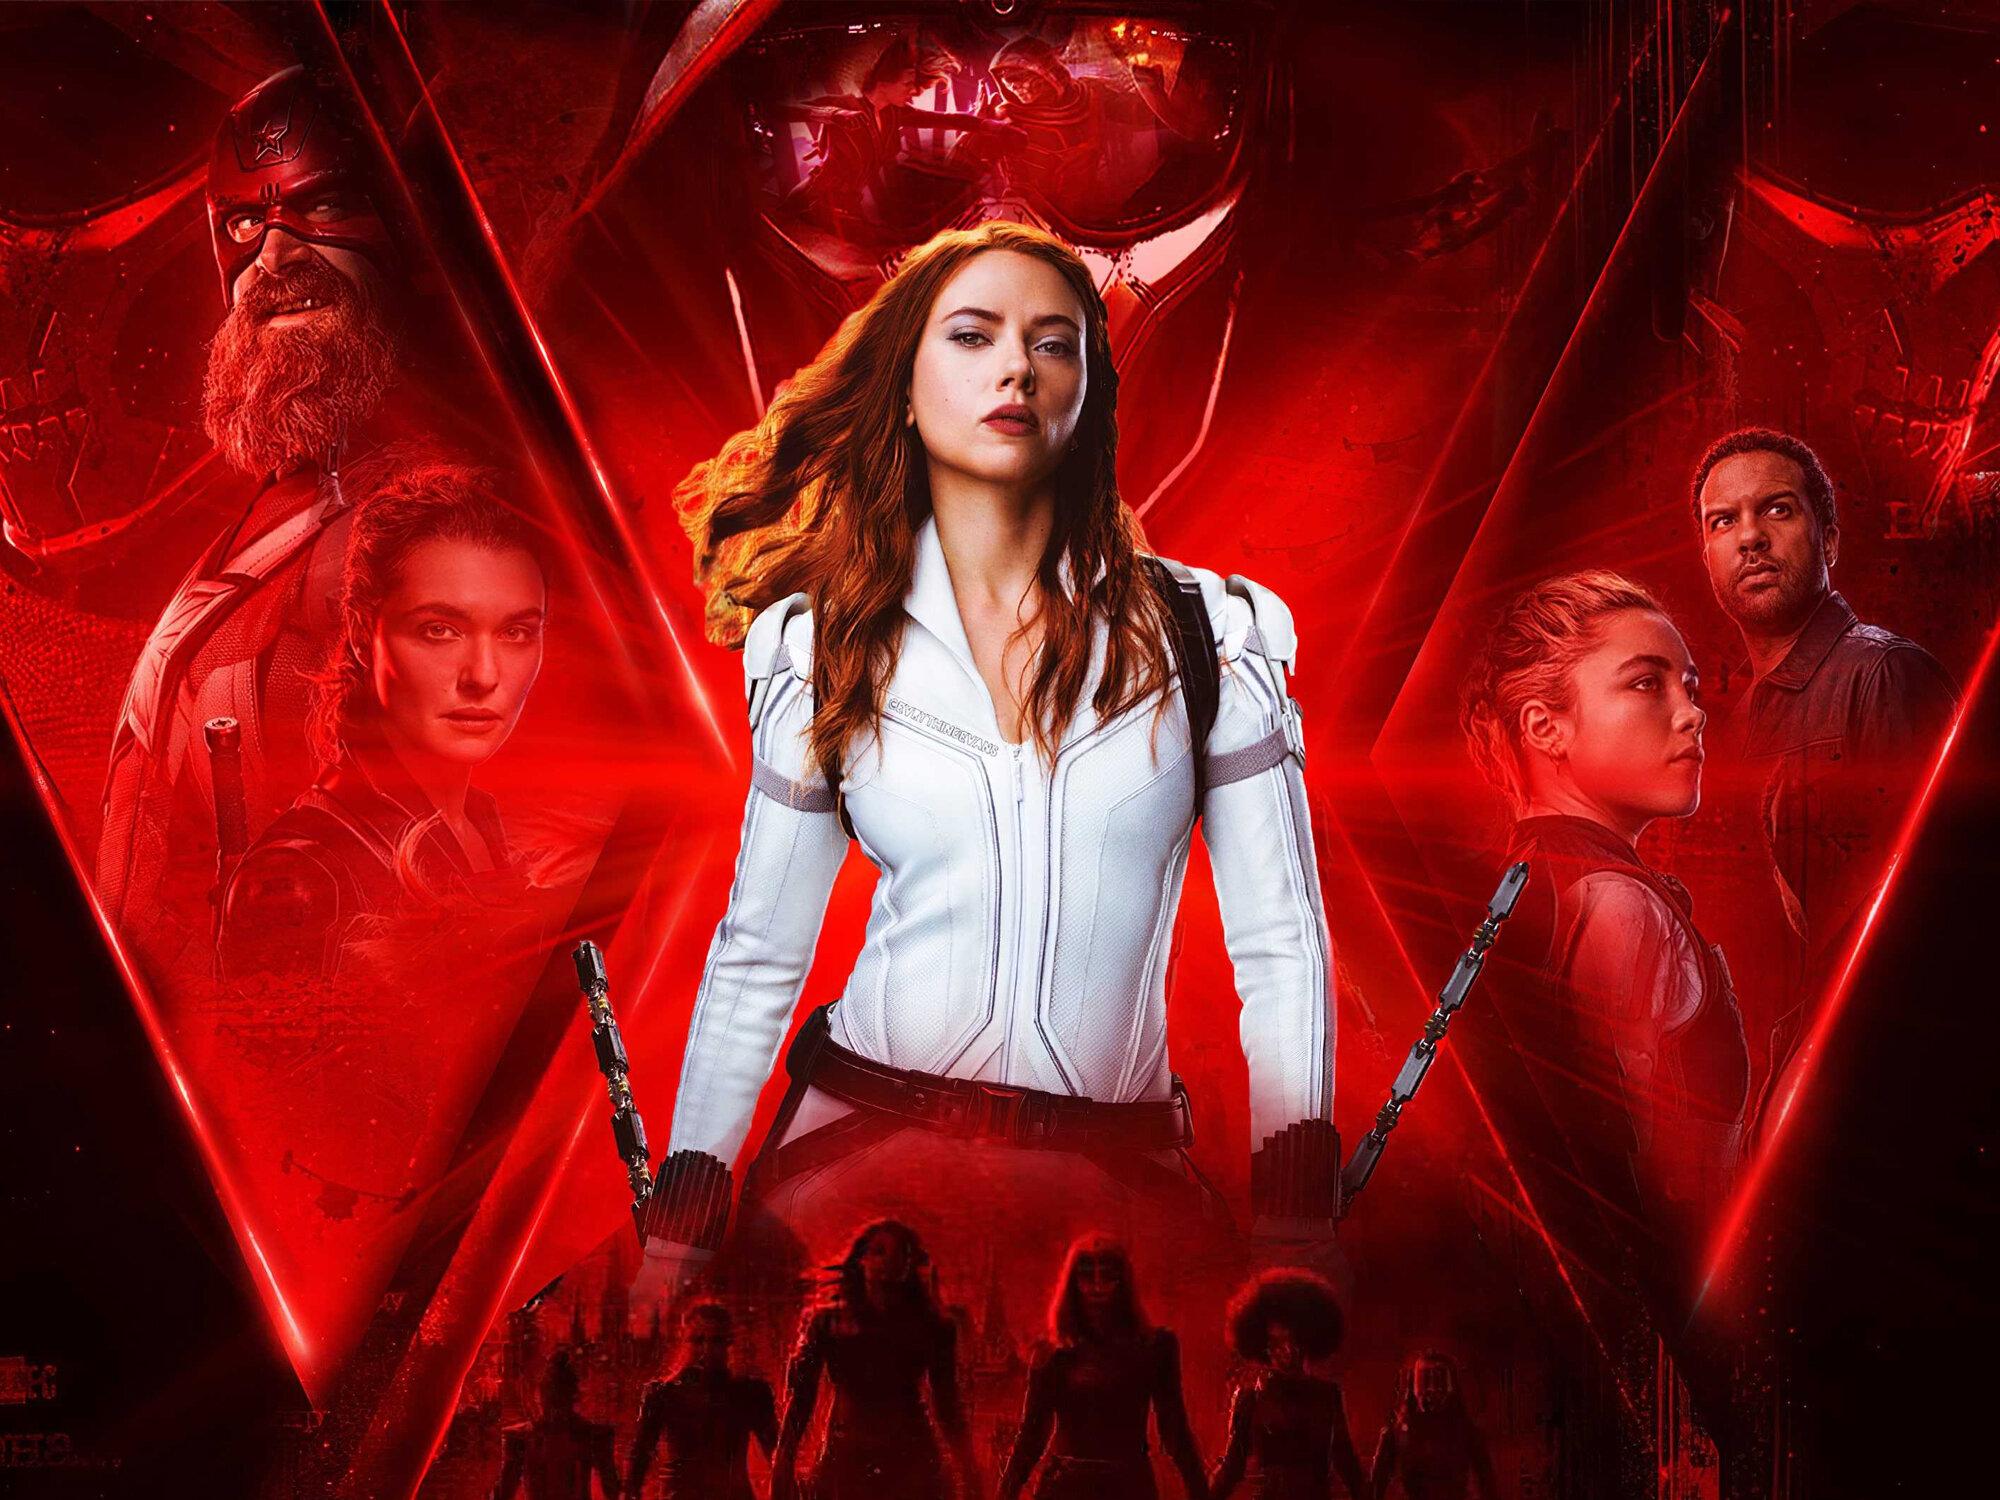 Natasha White - Action Movie